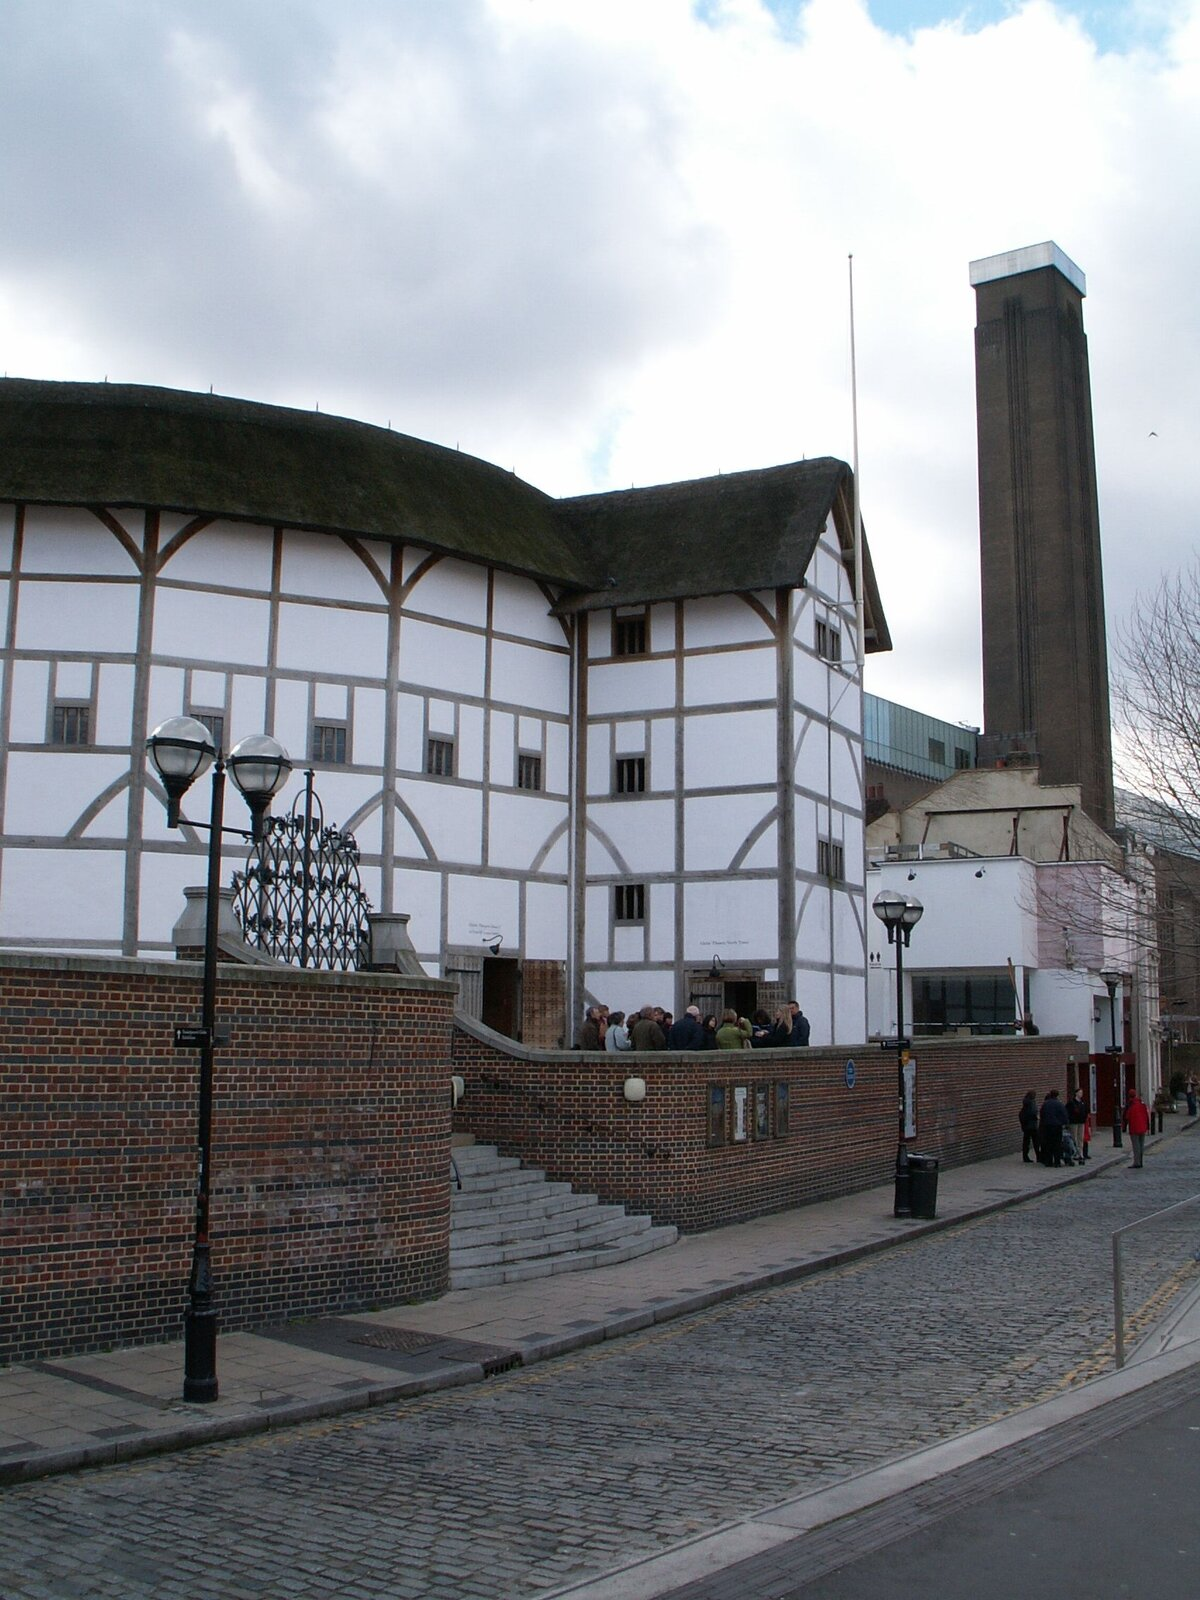 Teatr Globe wLondynie Teatr Globe wLondynie Źródło: Dickbauch, Wikimedia Commons, licencja: CC BY-SA 3.0.